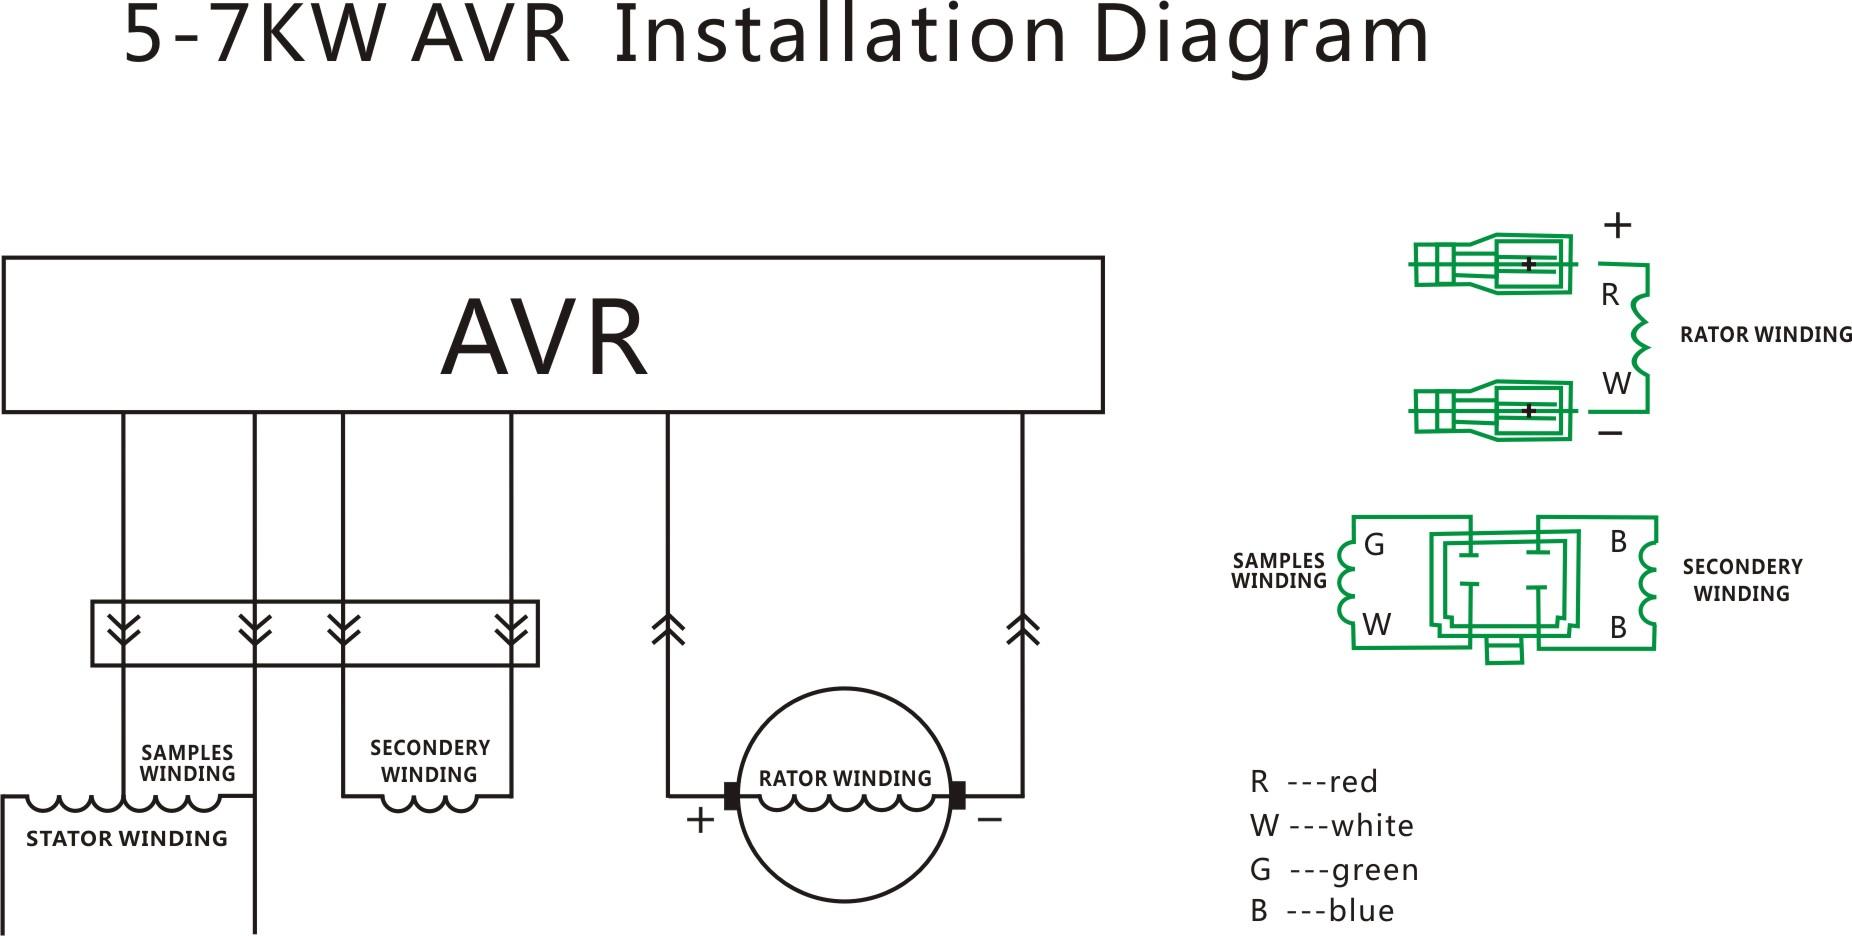 3 phase generator alternator wiring diagram auto electrical wiring3 phase generator alternator wiring diagram